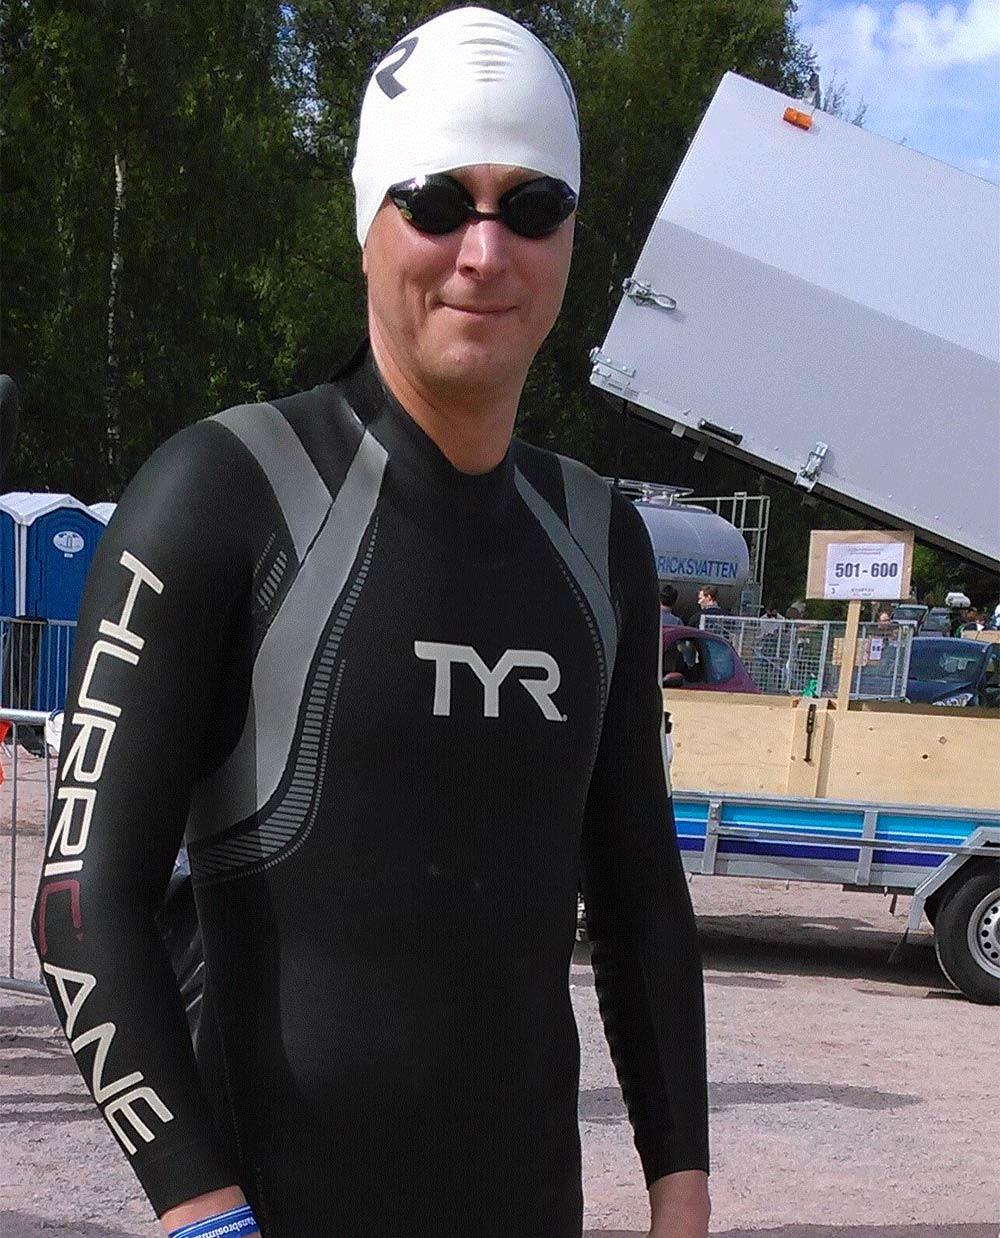 Martin Silfors